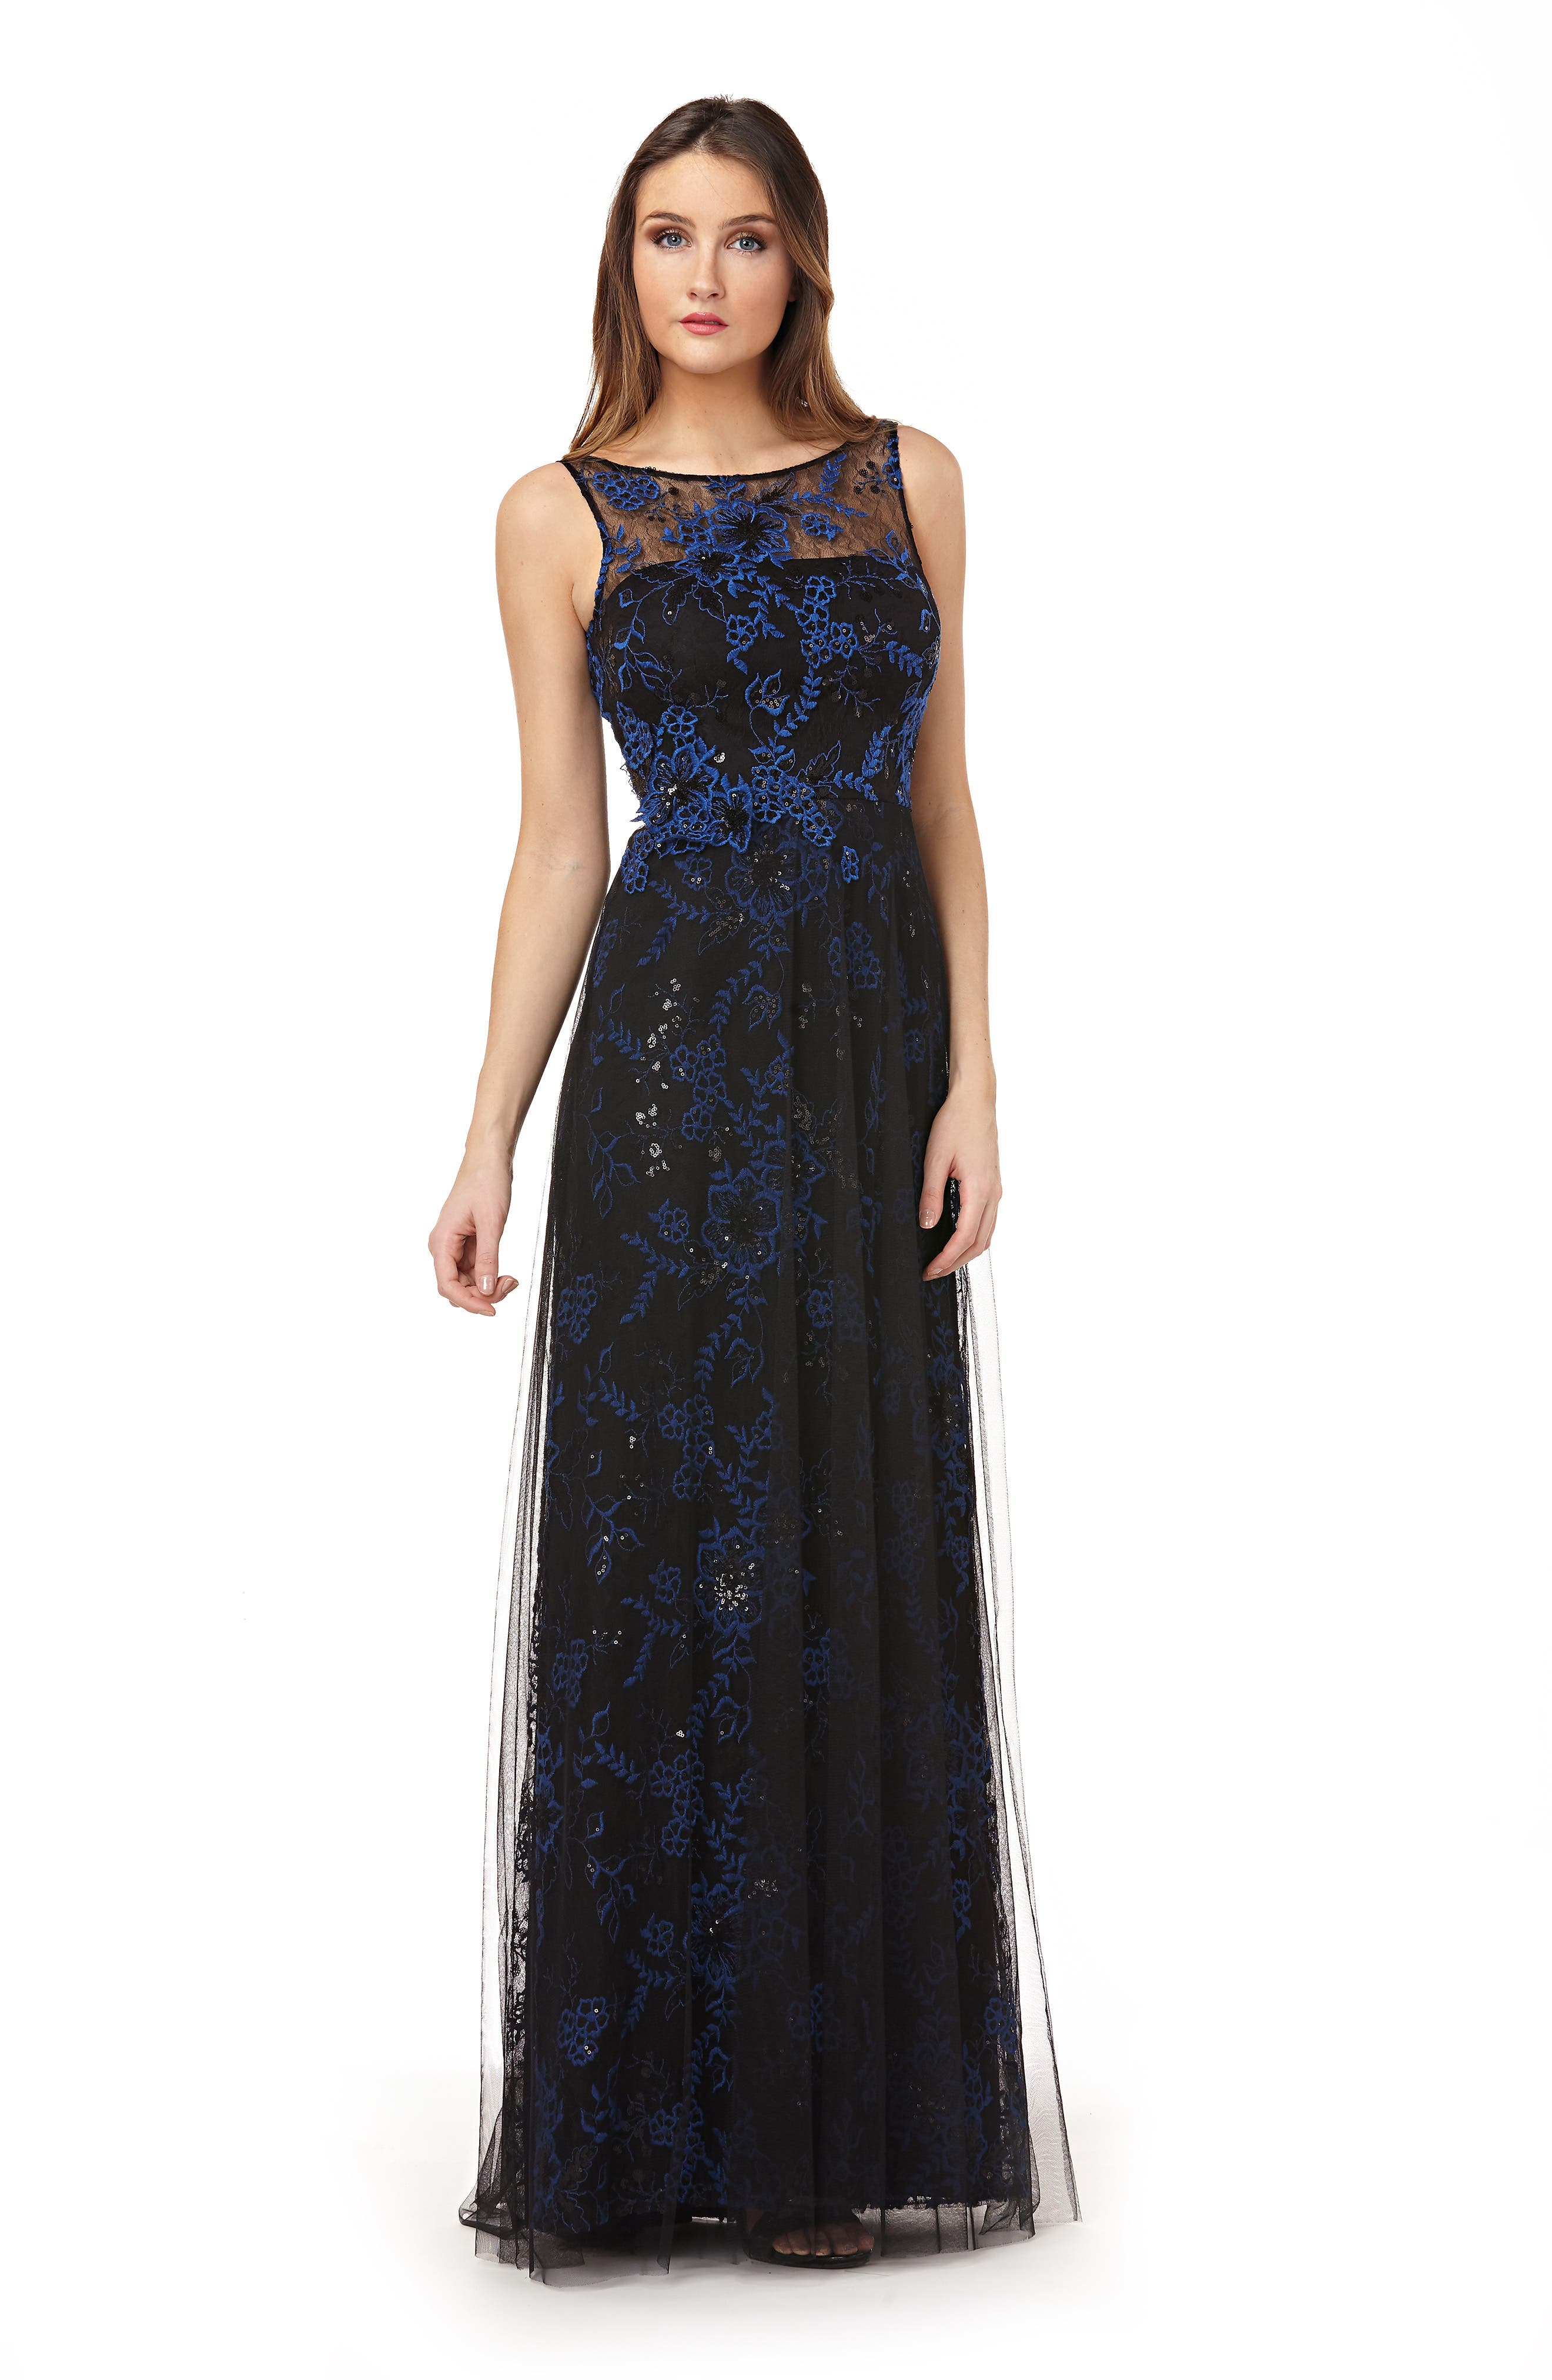 CARMEN MARC VALVO INFUSION,                             Sequin Threadwork Gown,                             Alternate thumbnail 6, color,                             COBALT/ BLACK